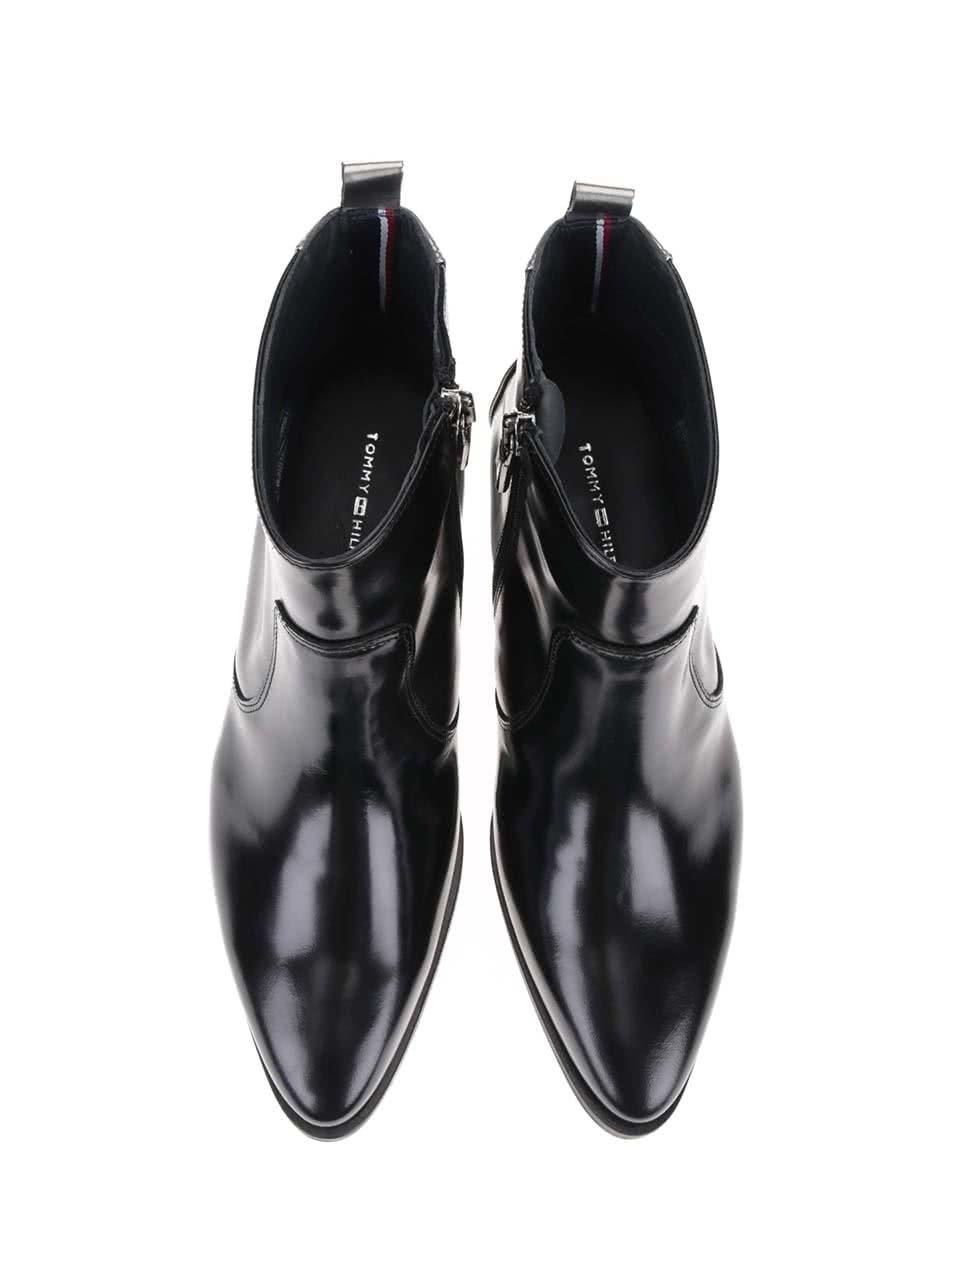 Čierne dámske kožené členkové topánky Tommy Hilfiger PIPPA ... 10bc1e0fec0